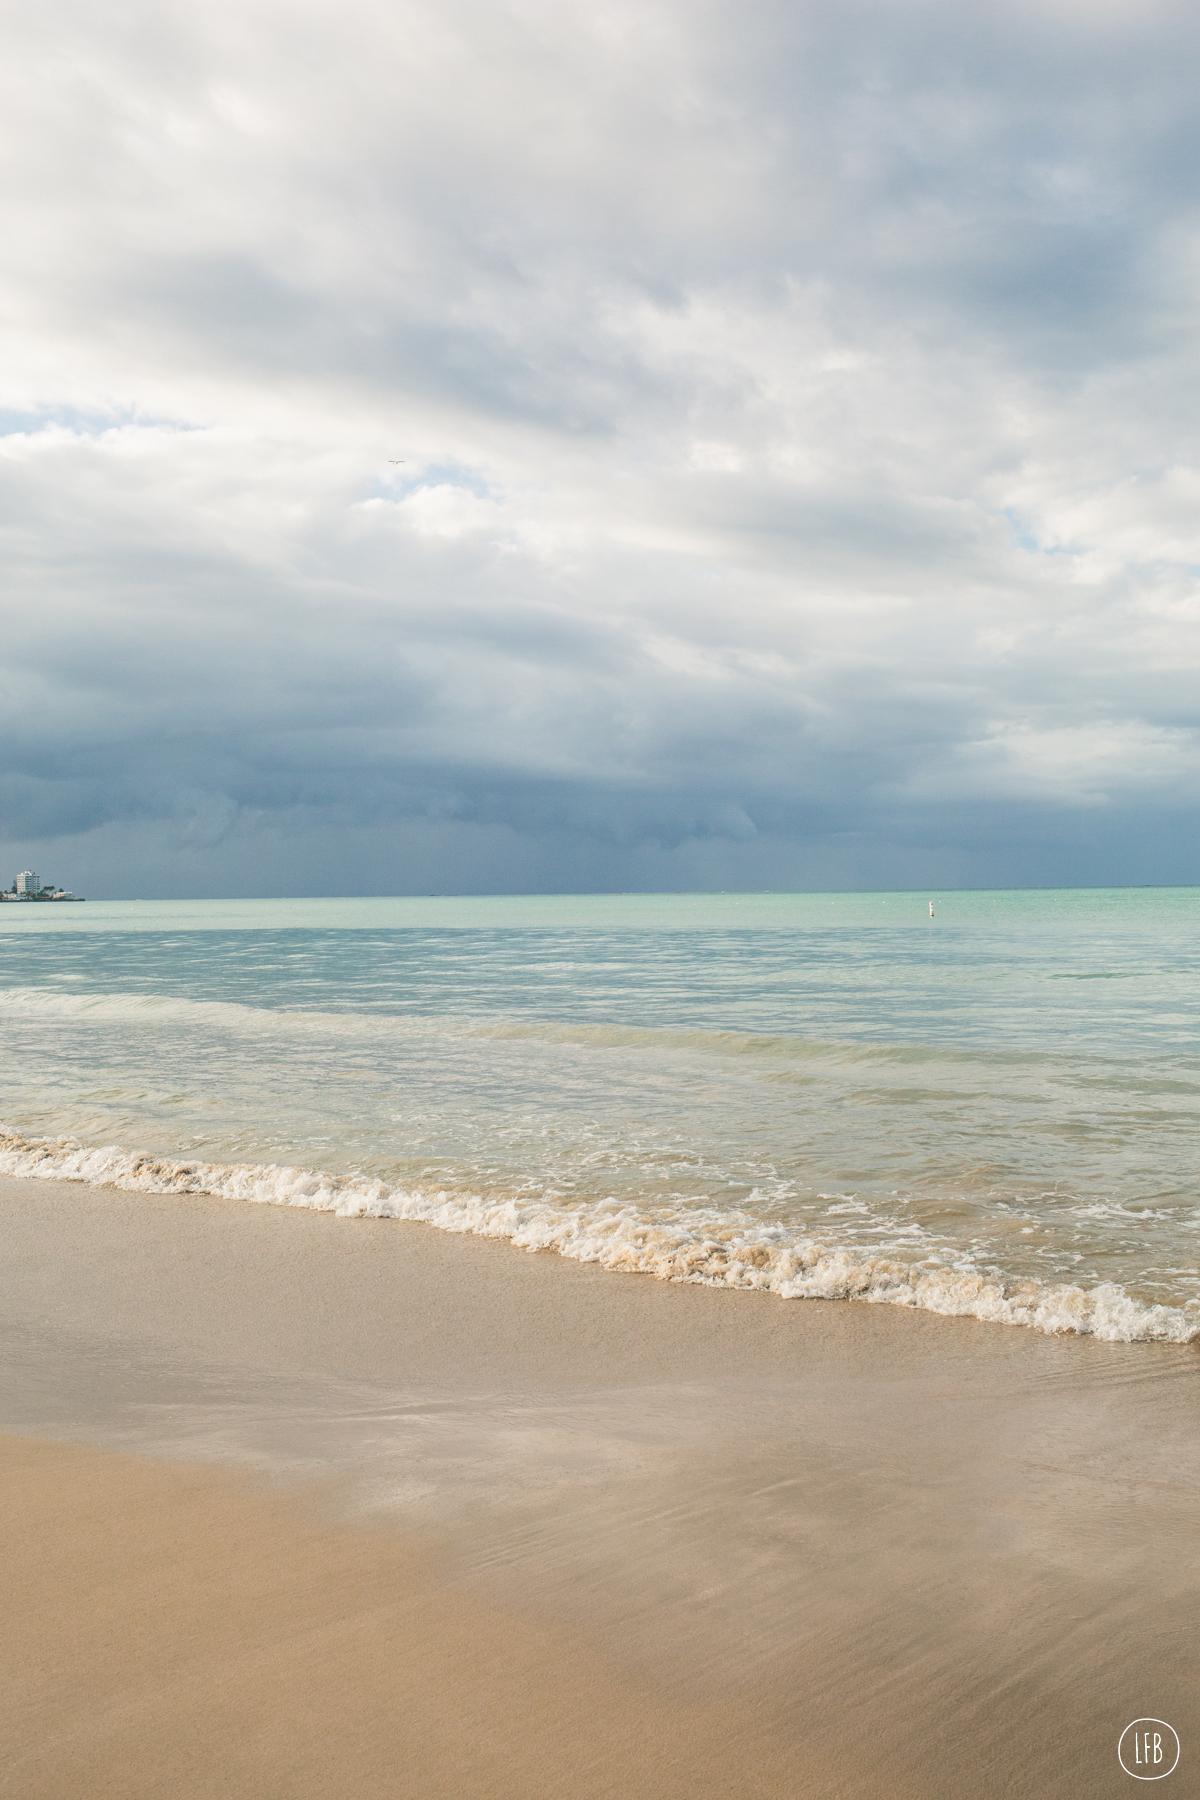 The Beach in Puerto Rico - photographer: Rae Tashman - for lovefromberlin.net